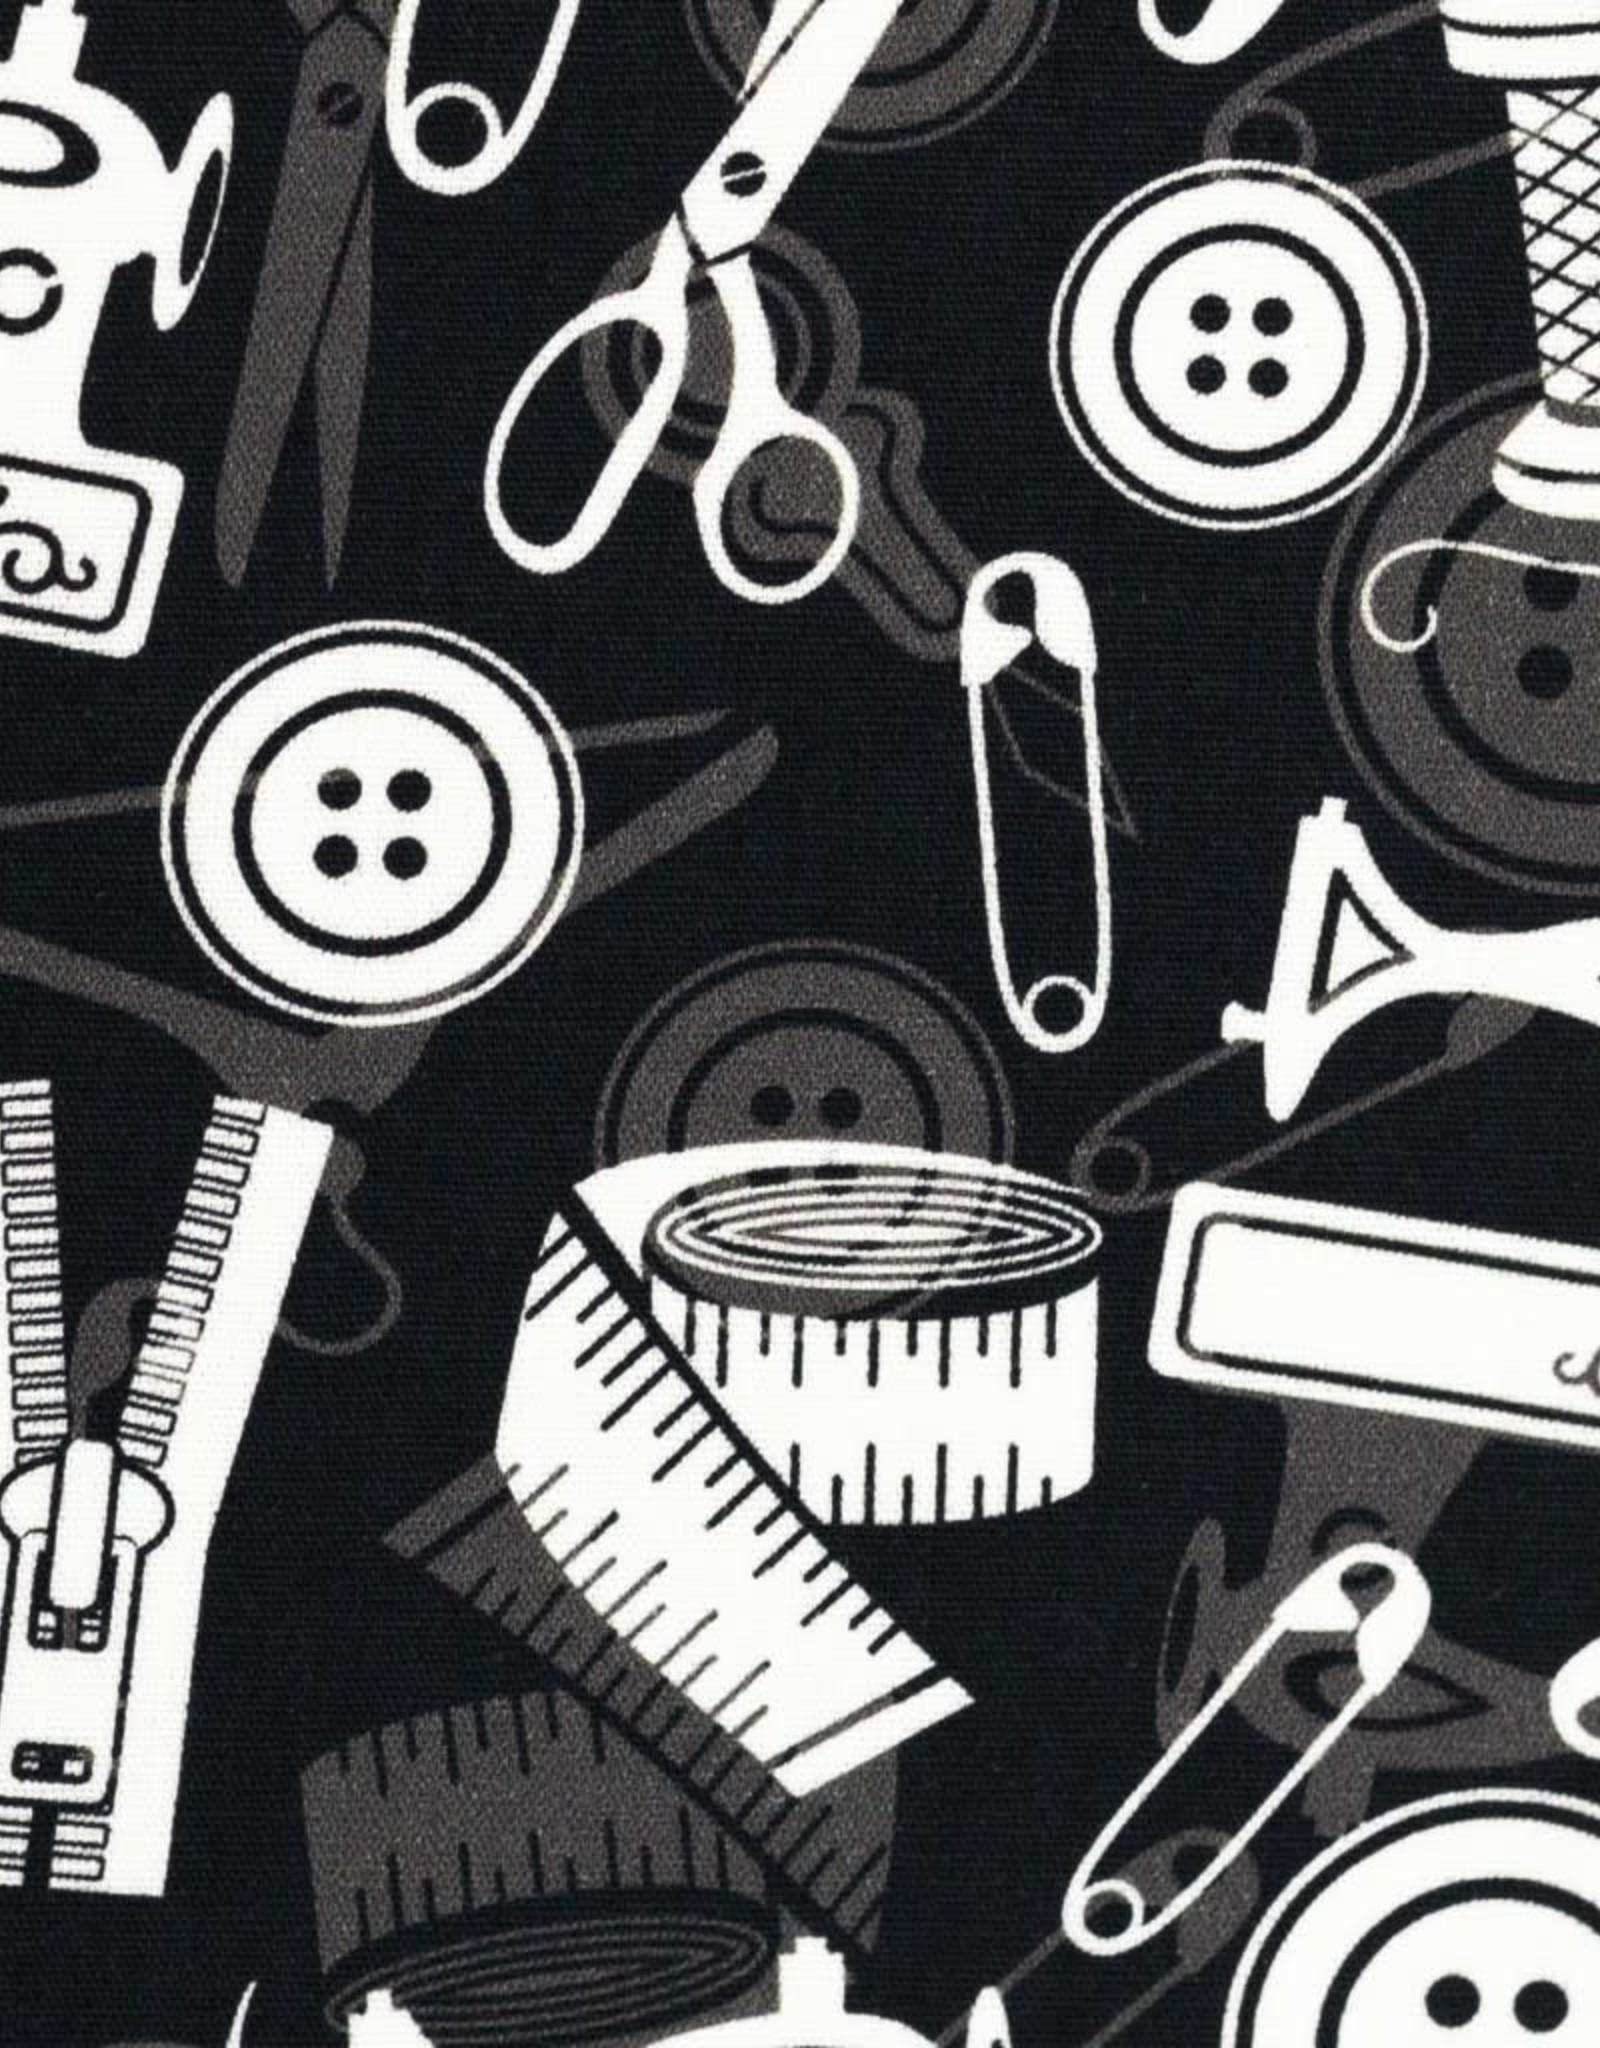 Katoen naaigerief zwart wit